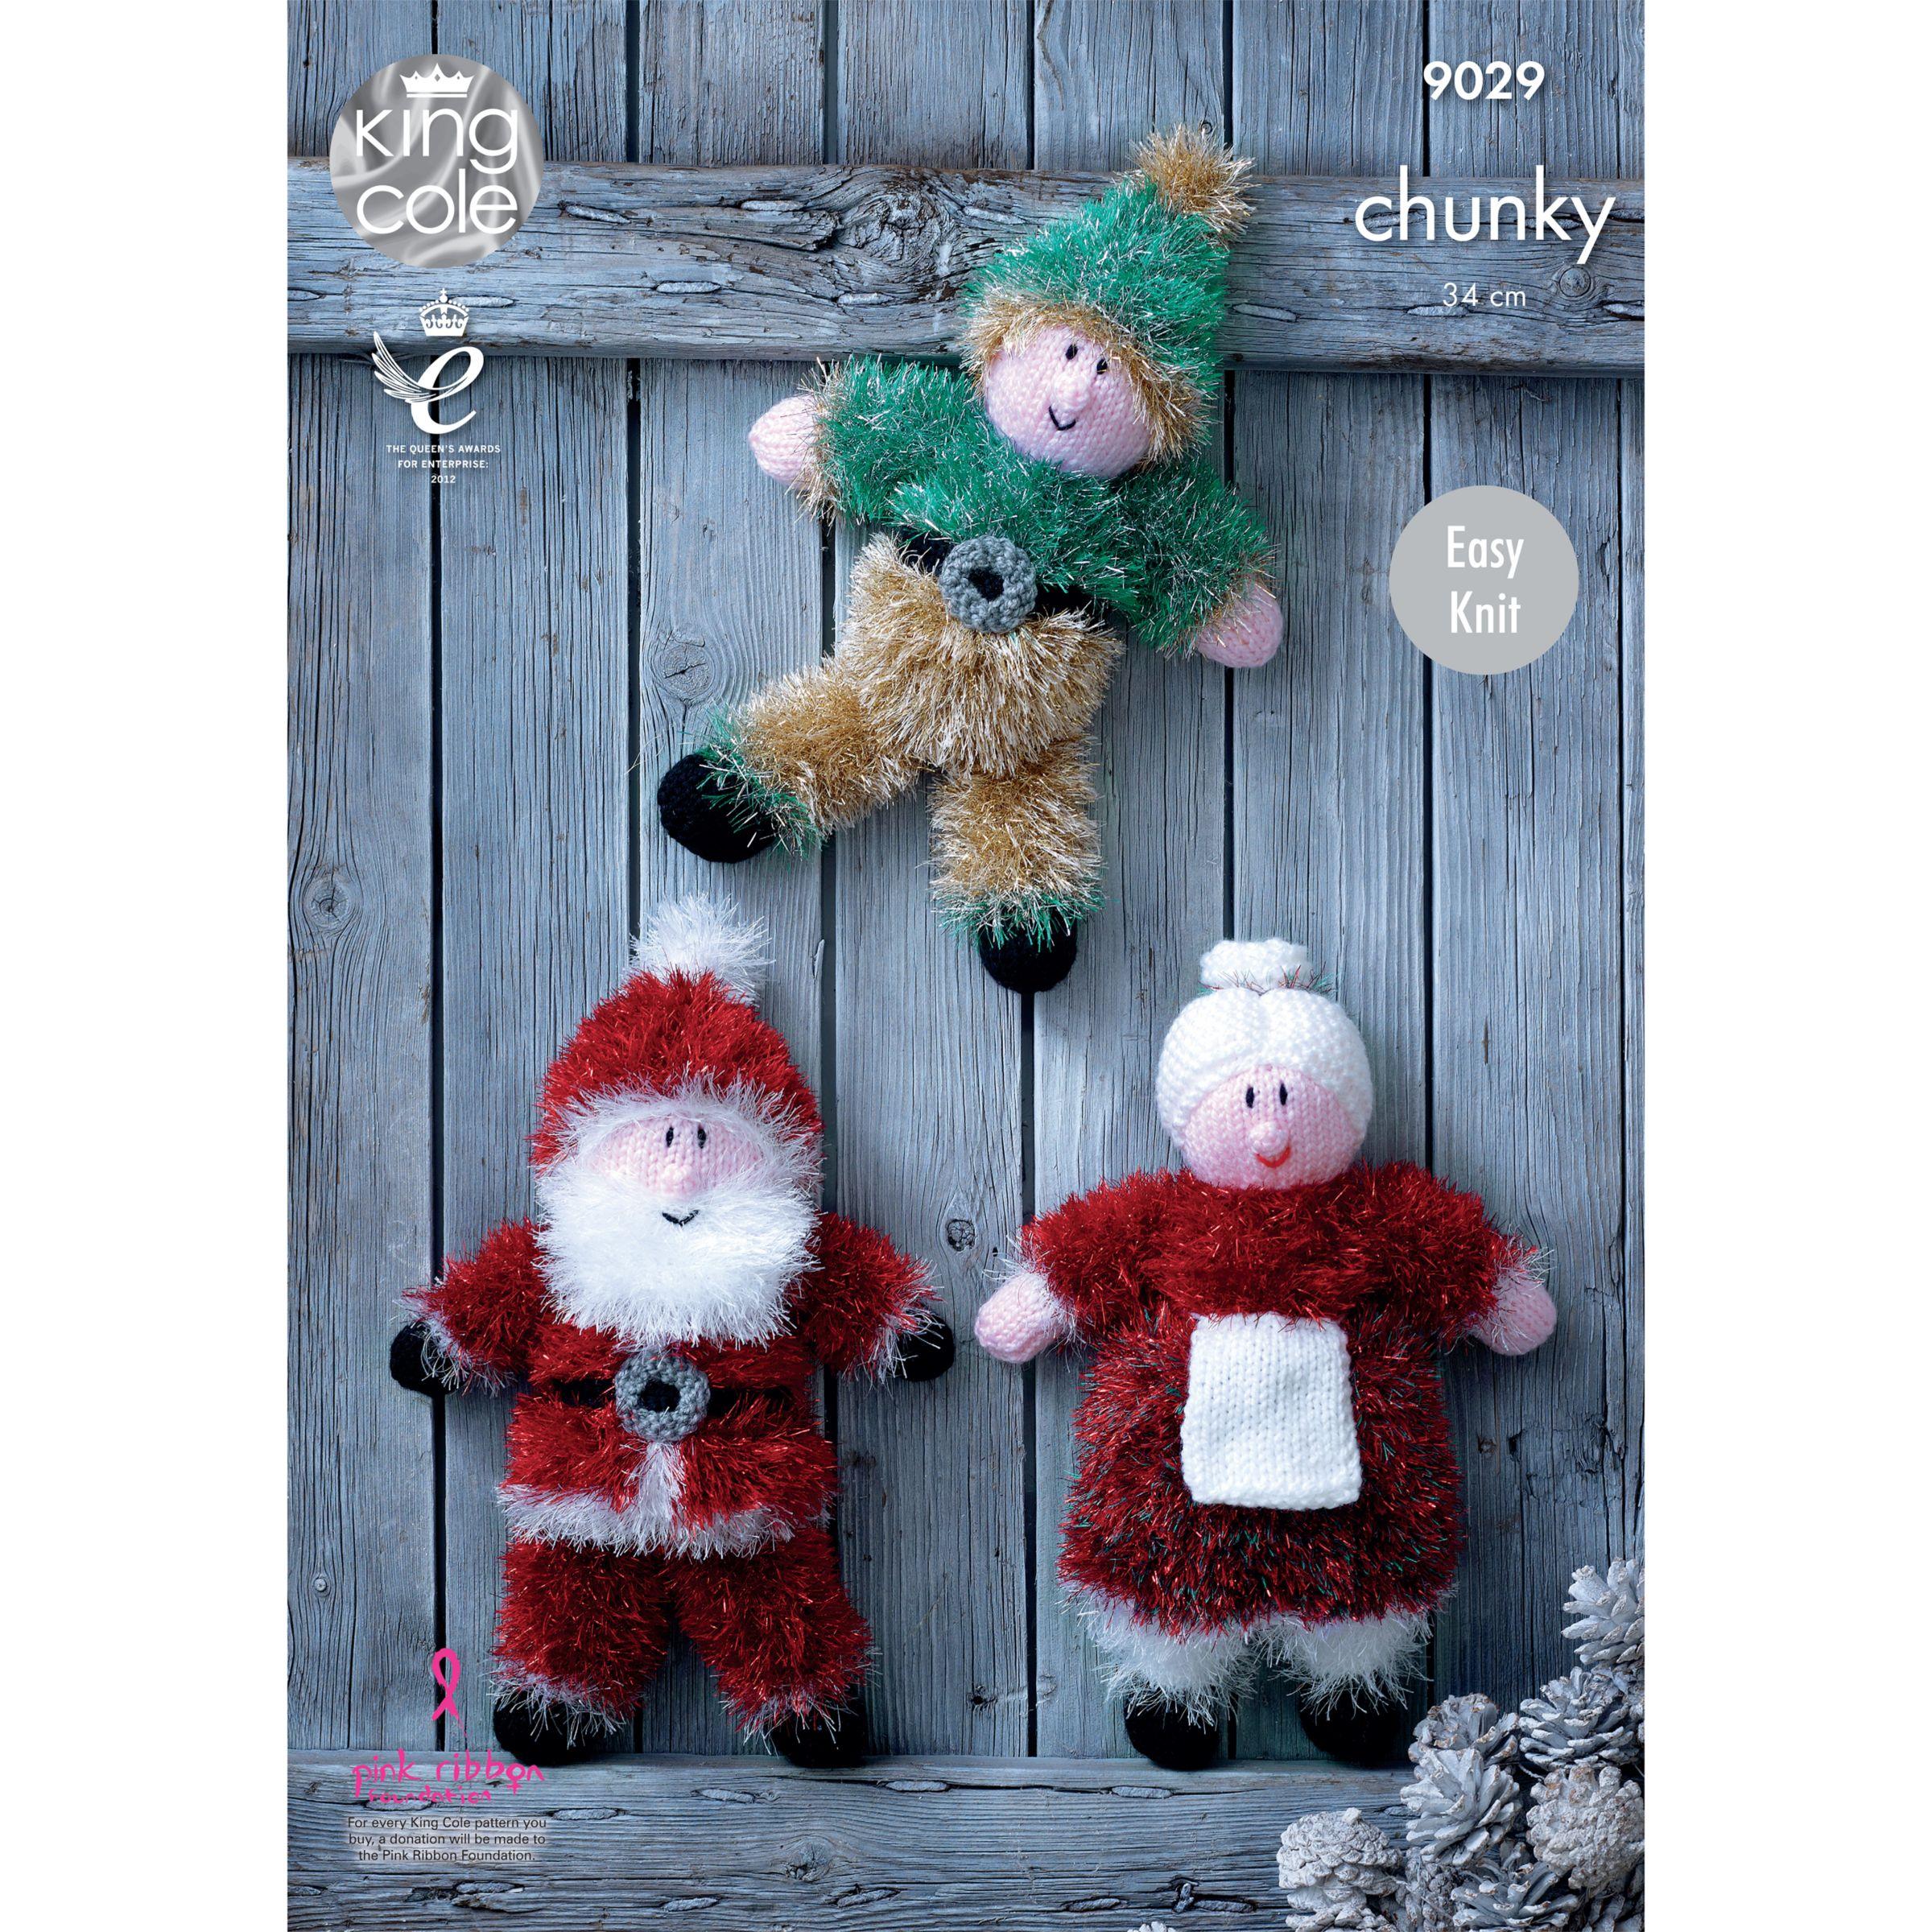 Christmas Crafts Christmas Crafts to Make John Lewis